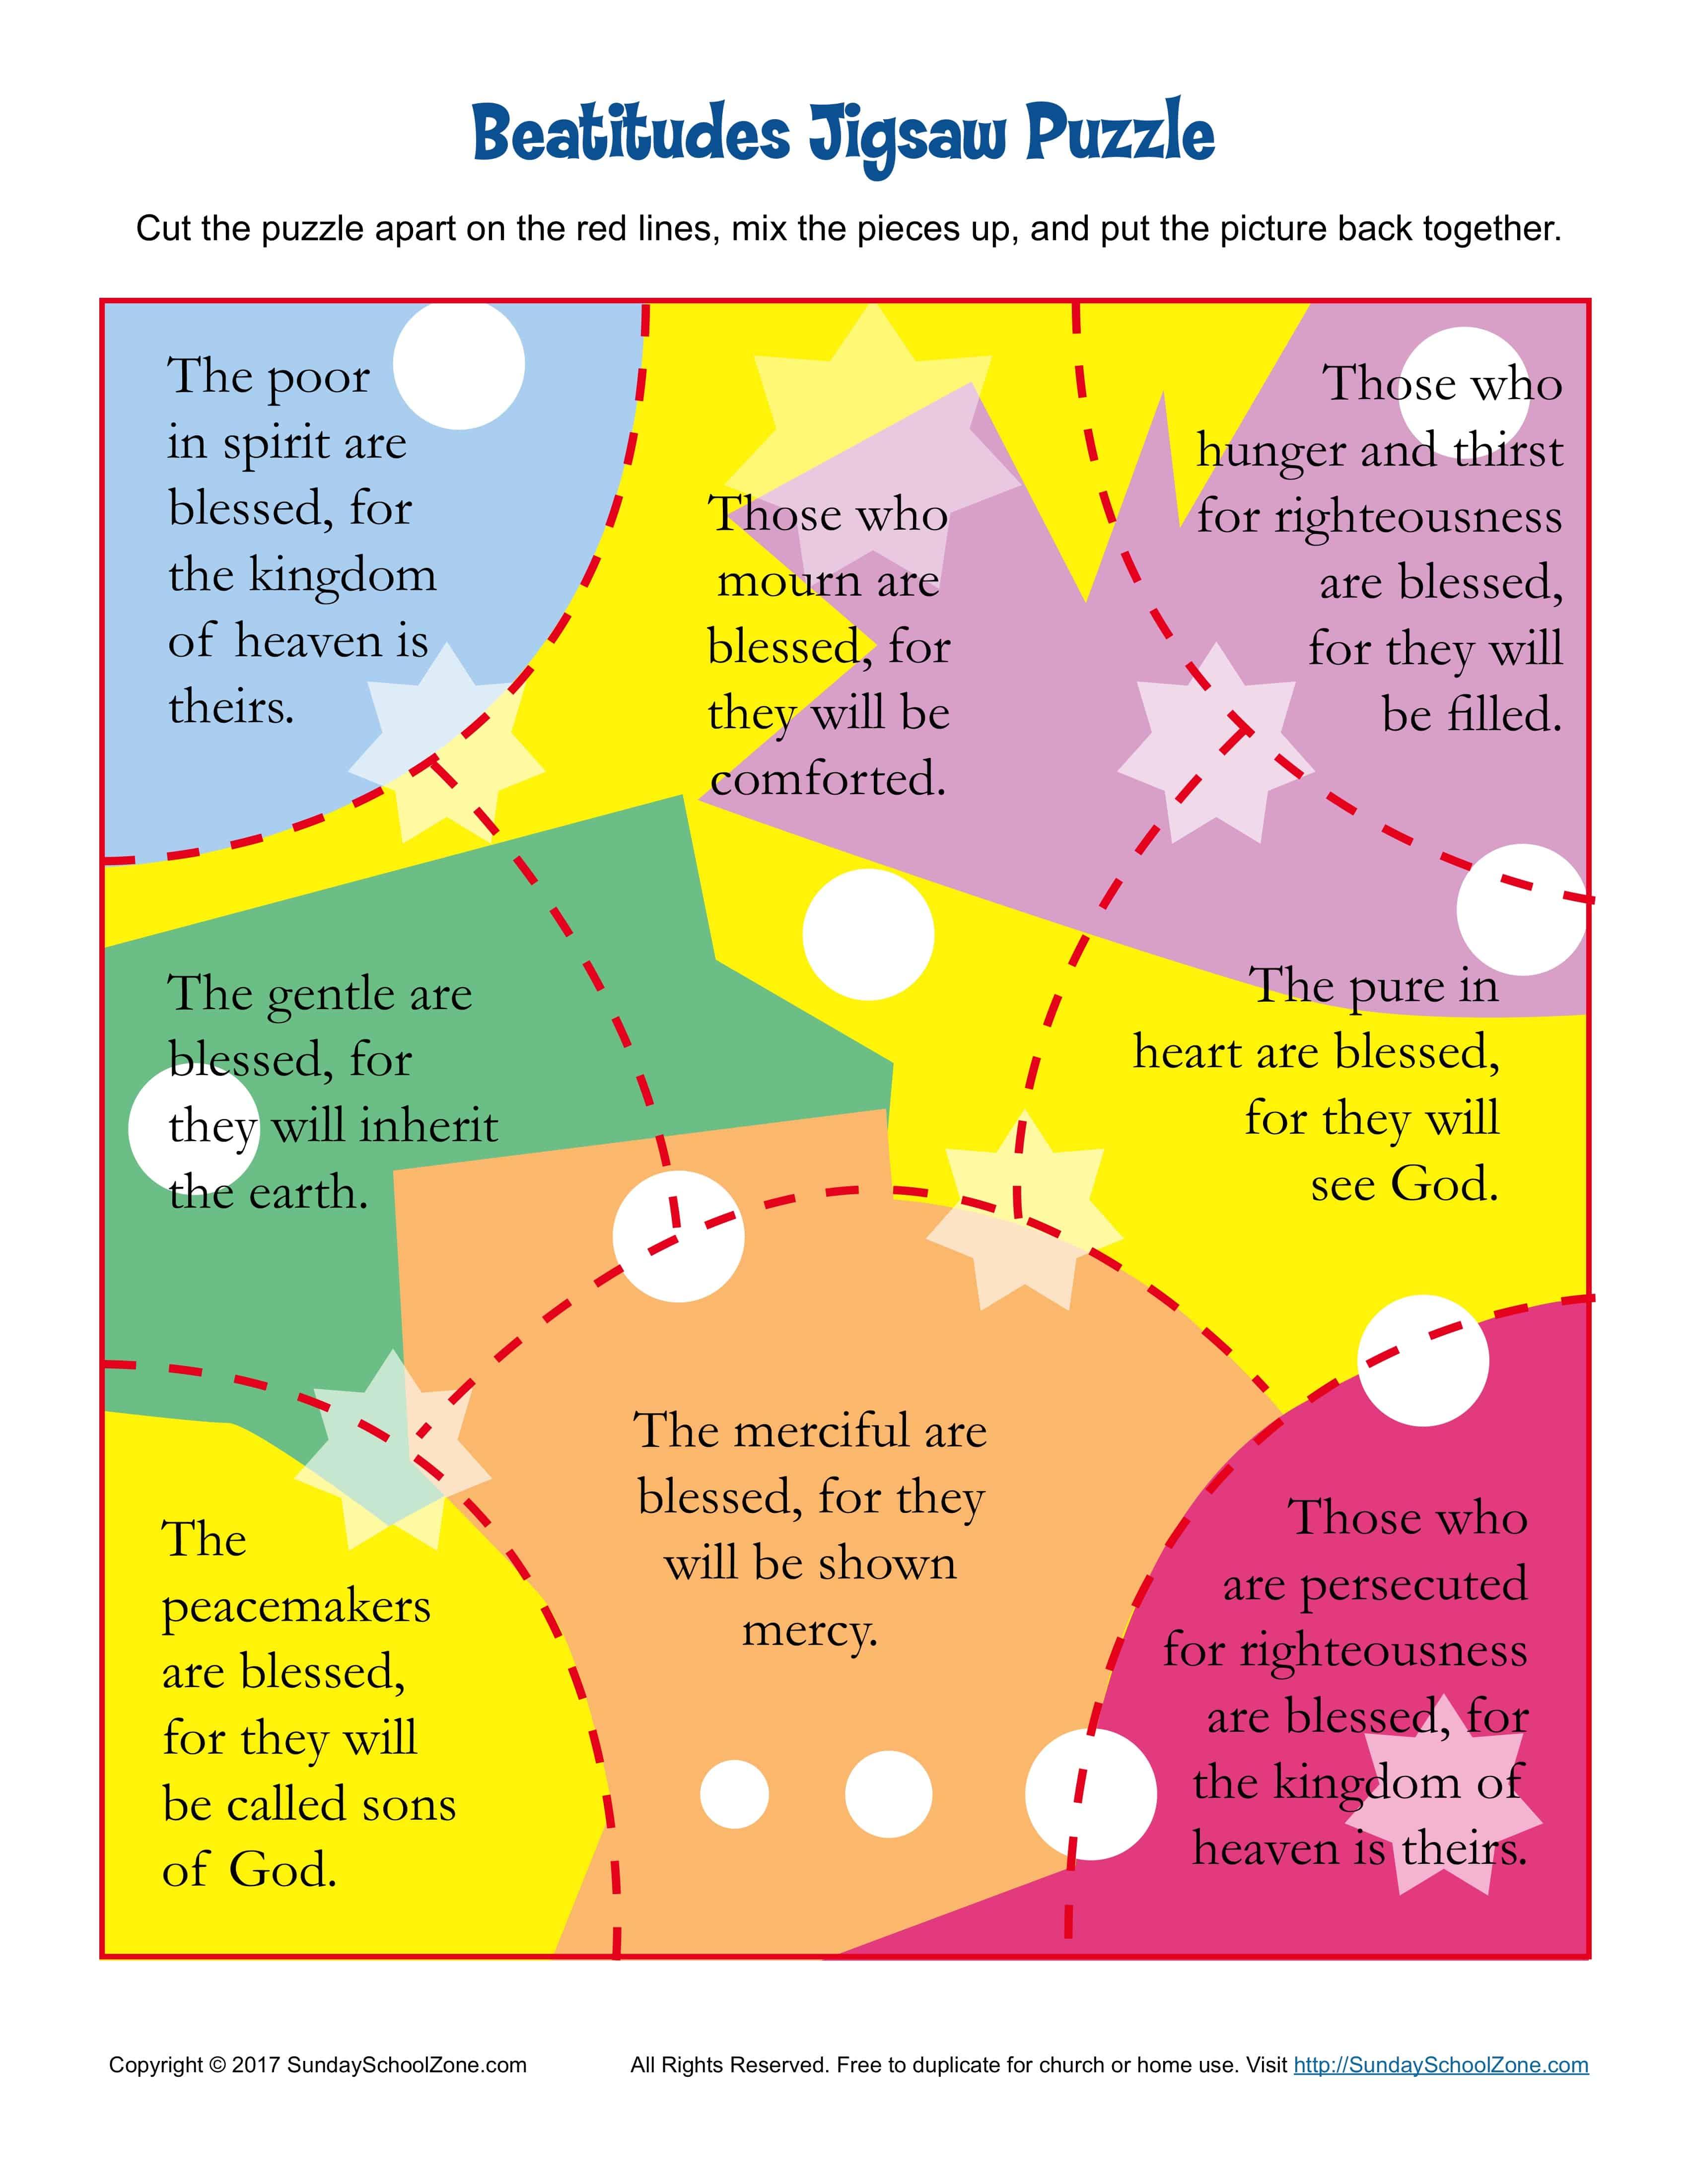 The Beatitudes Jigsaw Puzzle On Sunday School Zone